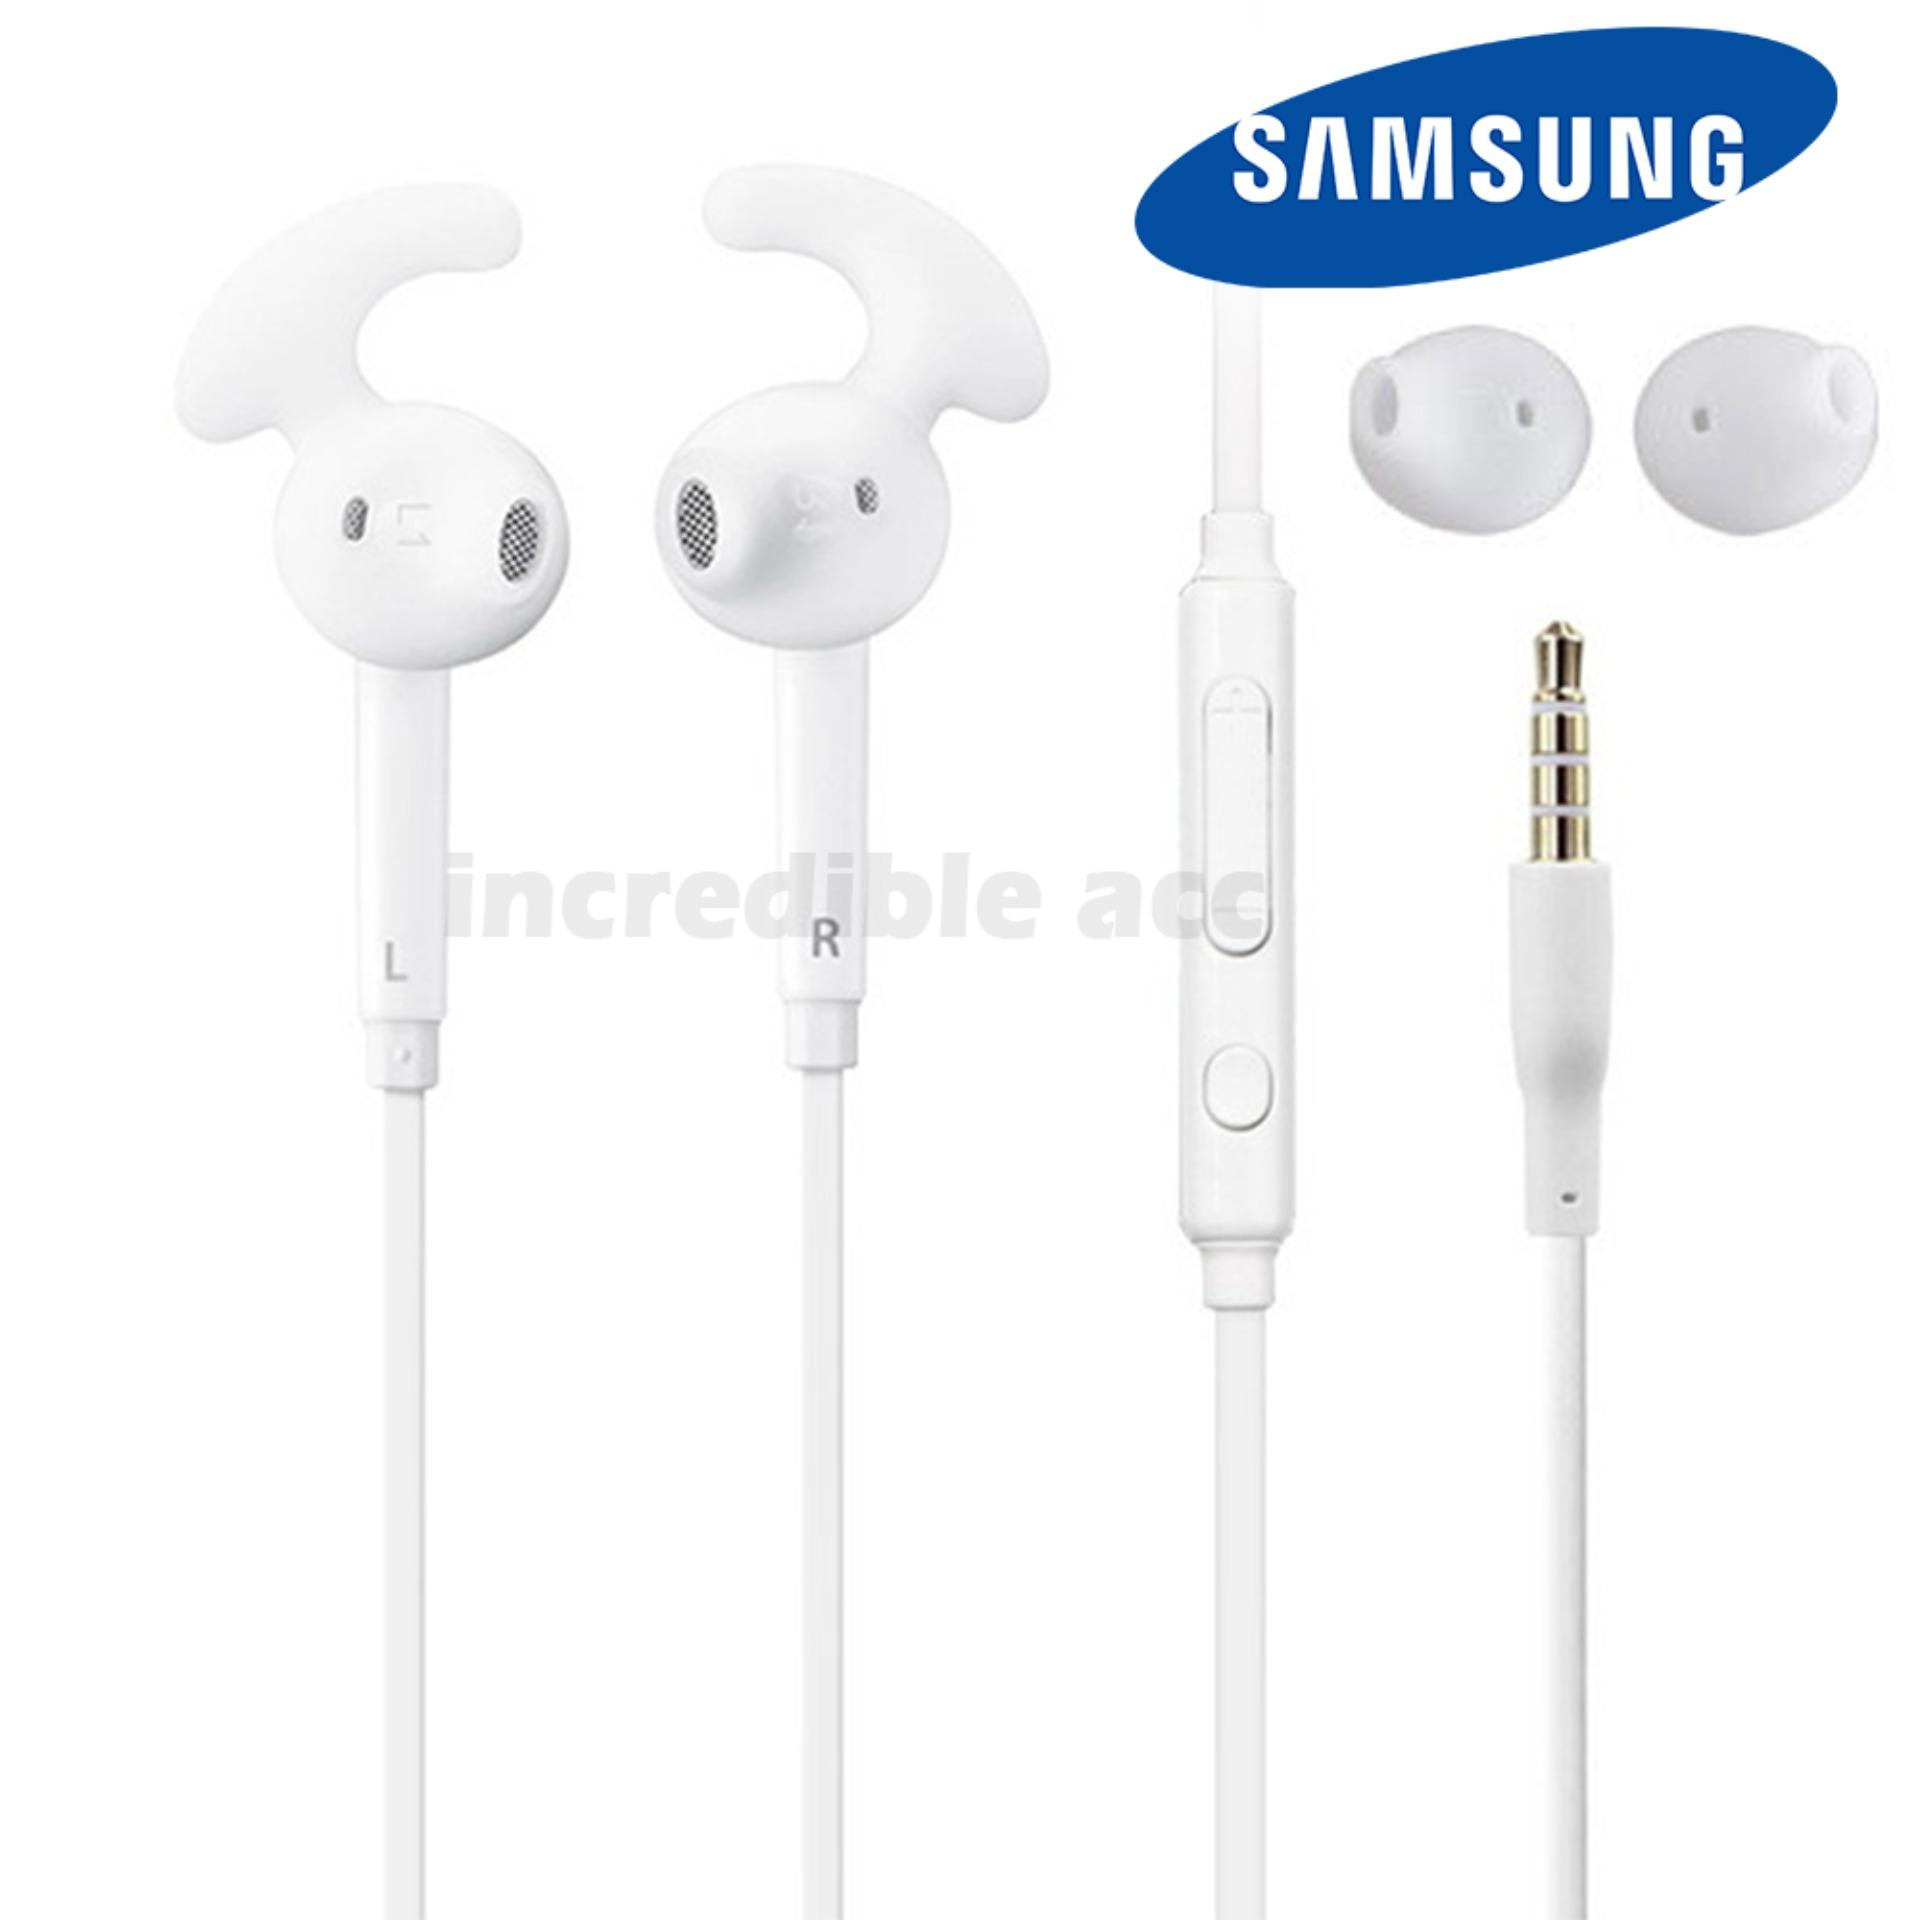 Samsung Headset In-Ear Handsfree EO-EG920 for Samsung Galaxy S5, S6, S7, S7 Edge 3.5mm Stereo Sports Earphone Bass HD Audio - White